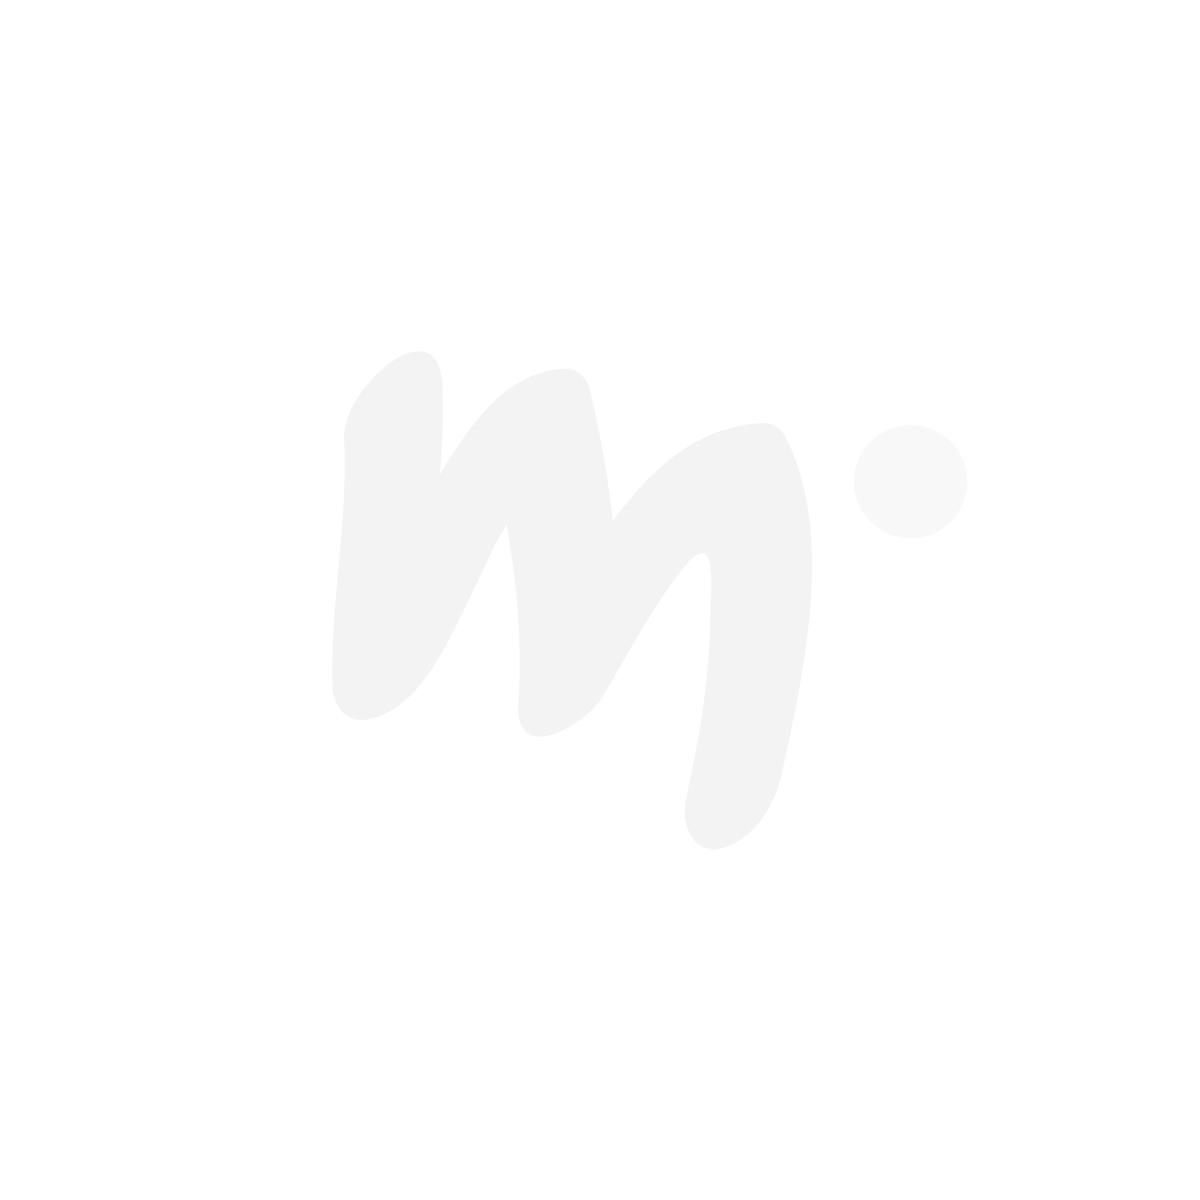 Moomin Affection Cookie Cutter Set